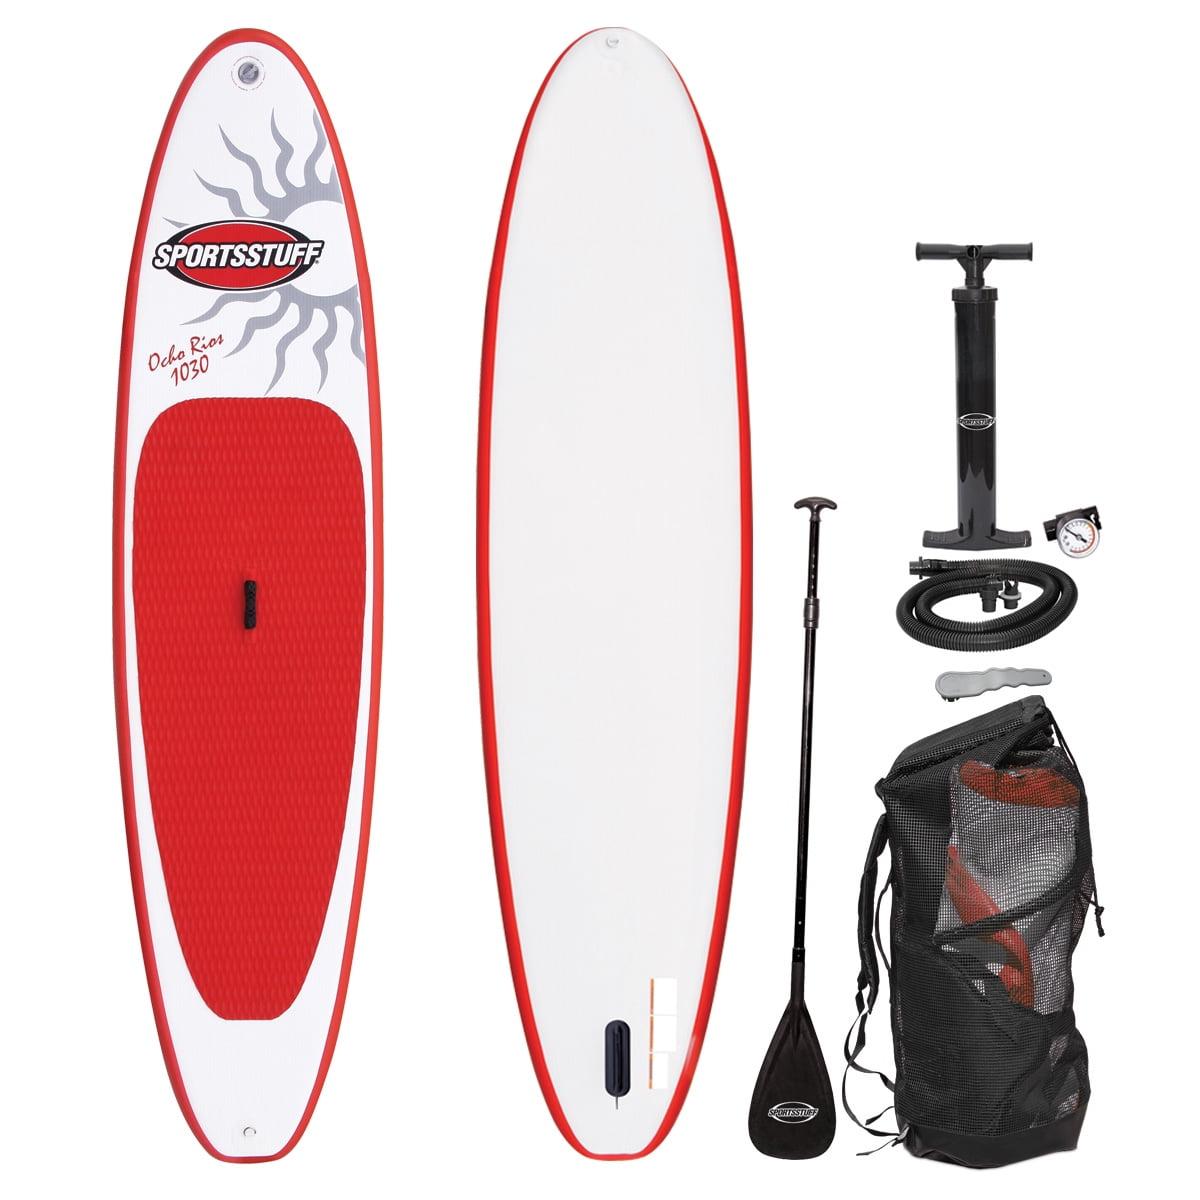 OCHORIOS SUP Paddleboard